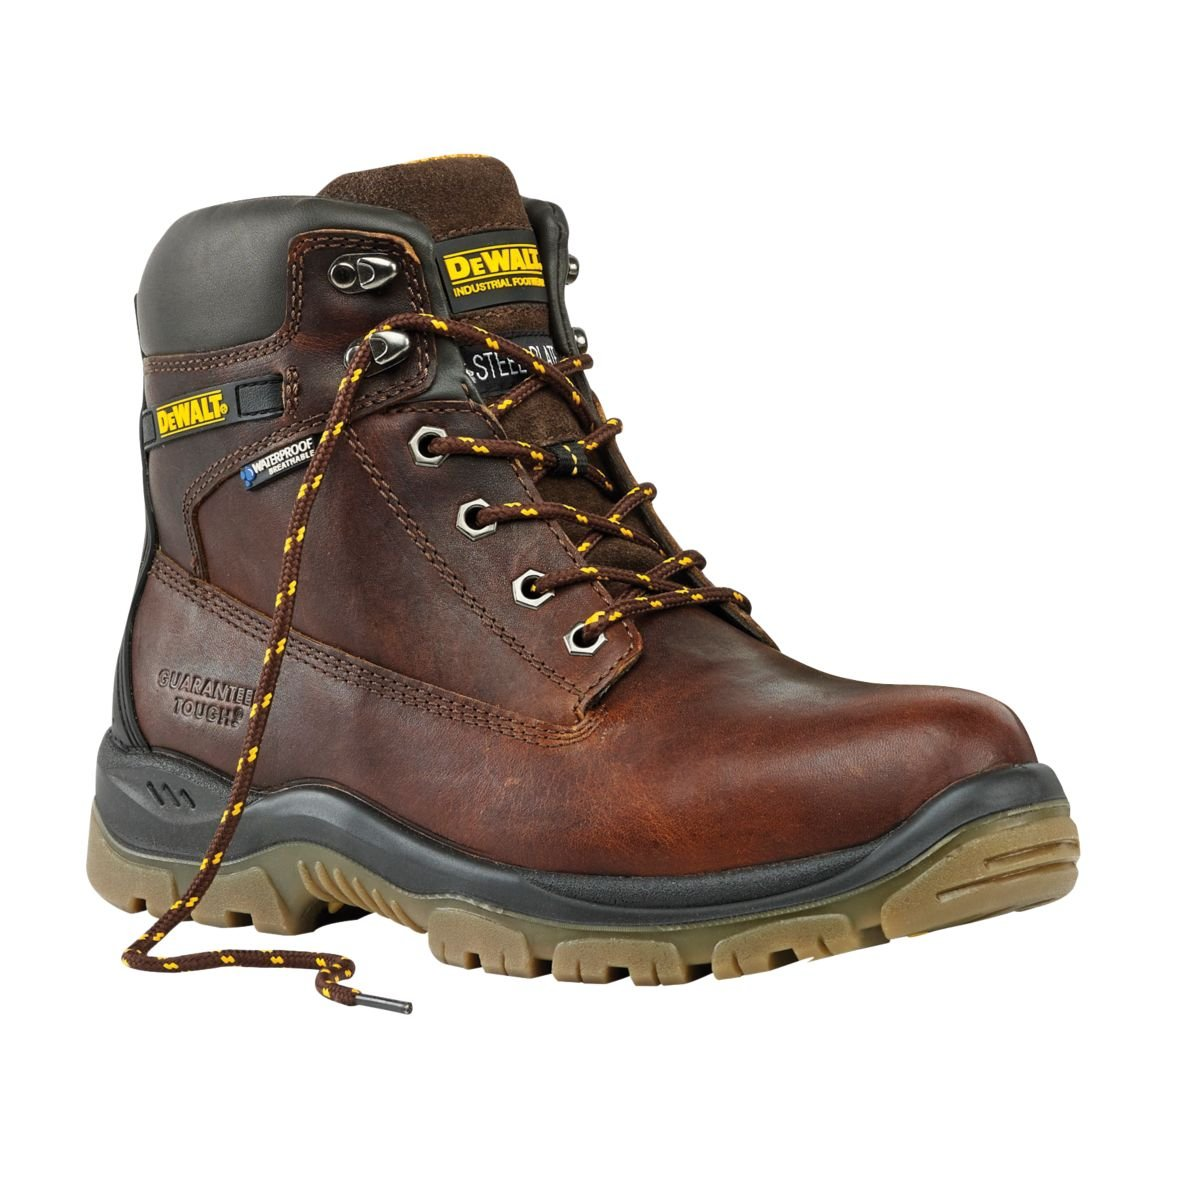 DeWalt Titanium Safety Boots Tan Size 9